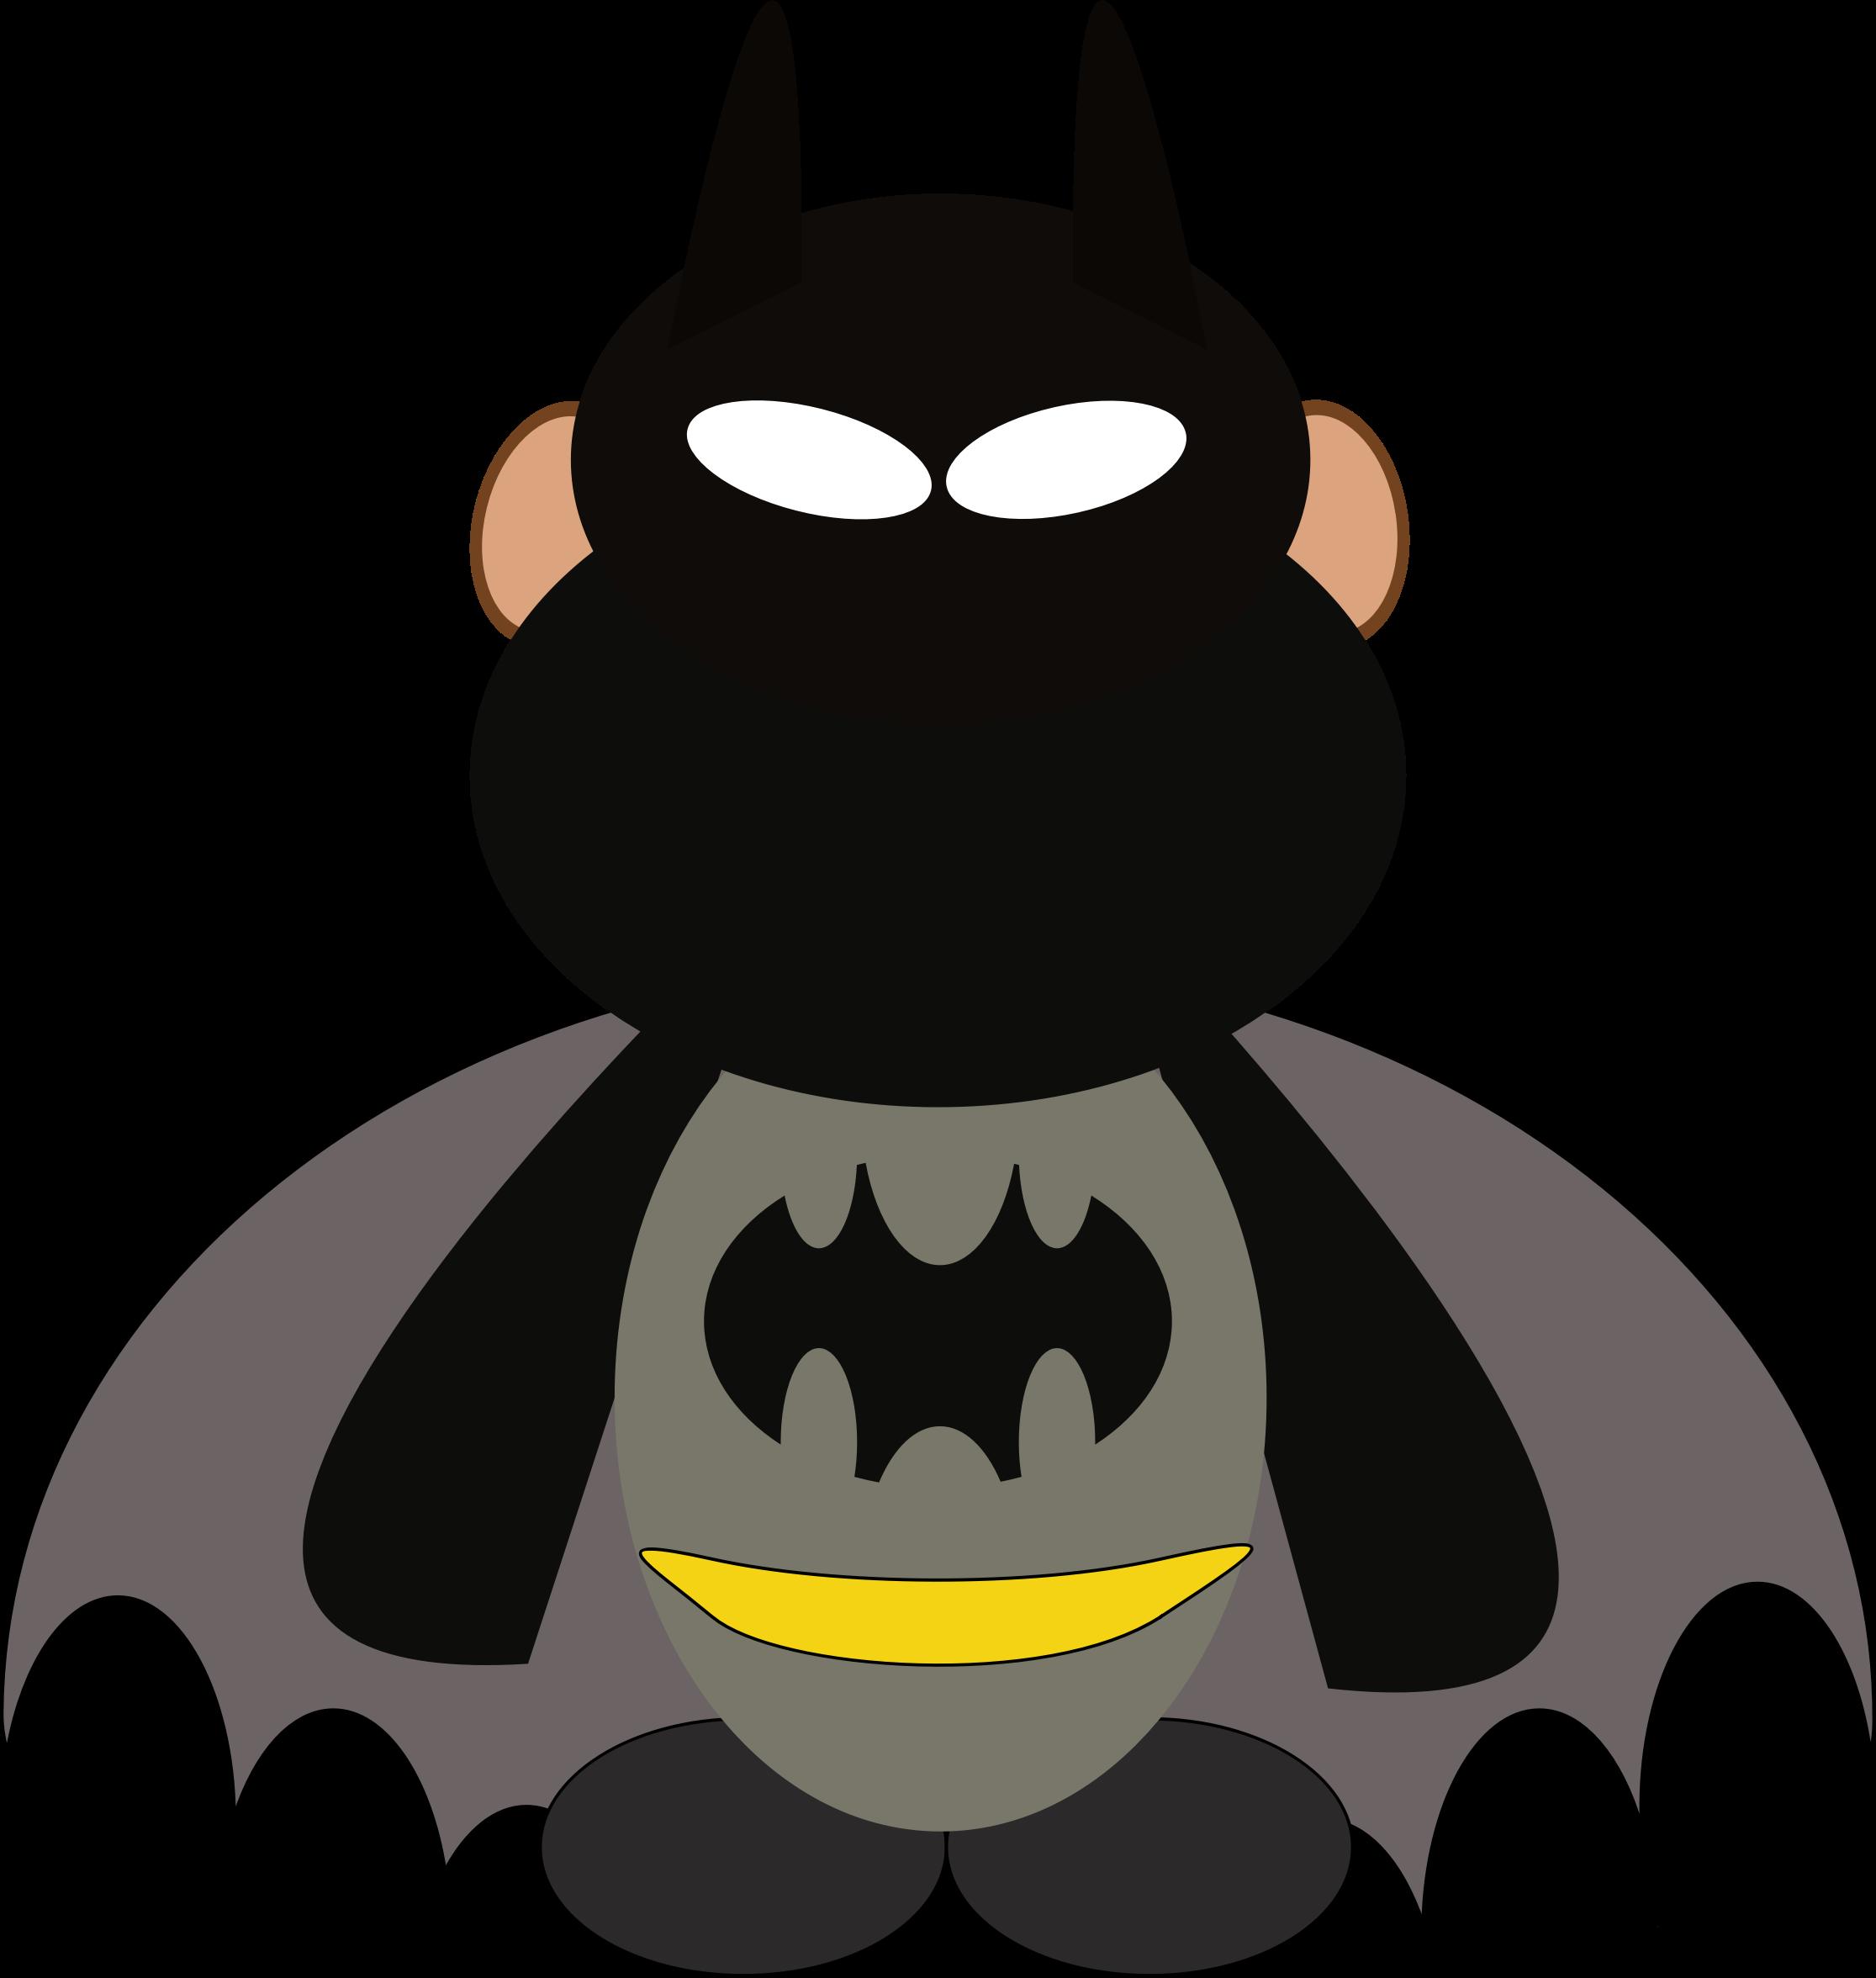 Justice clipart animated. Comic monkey big image